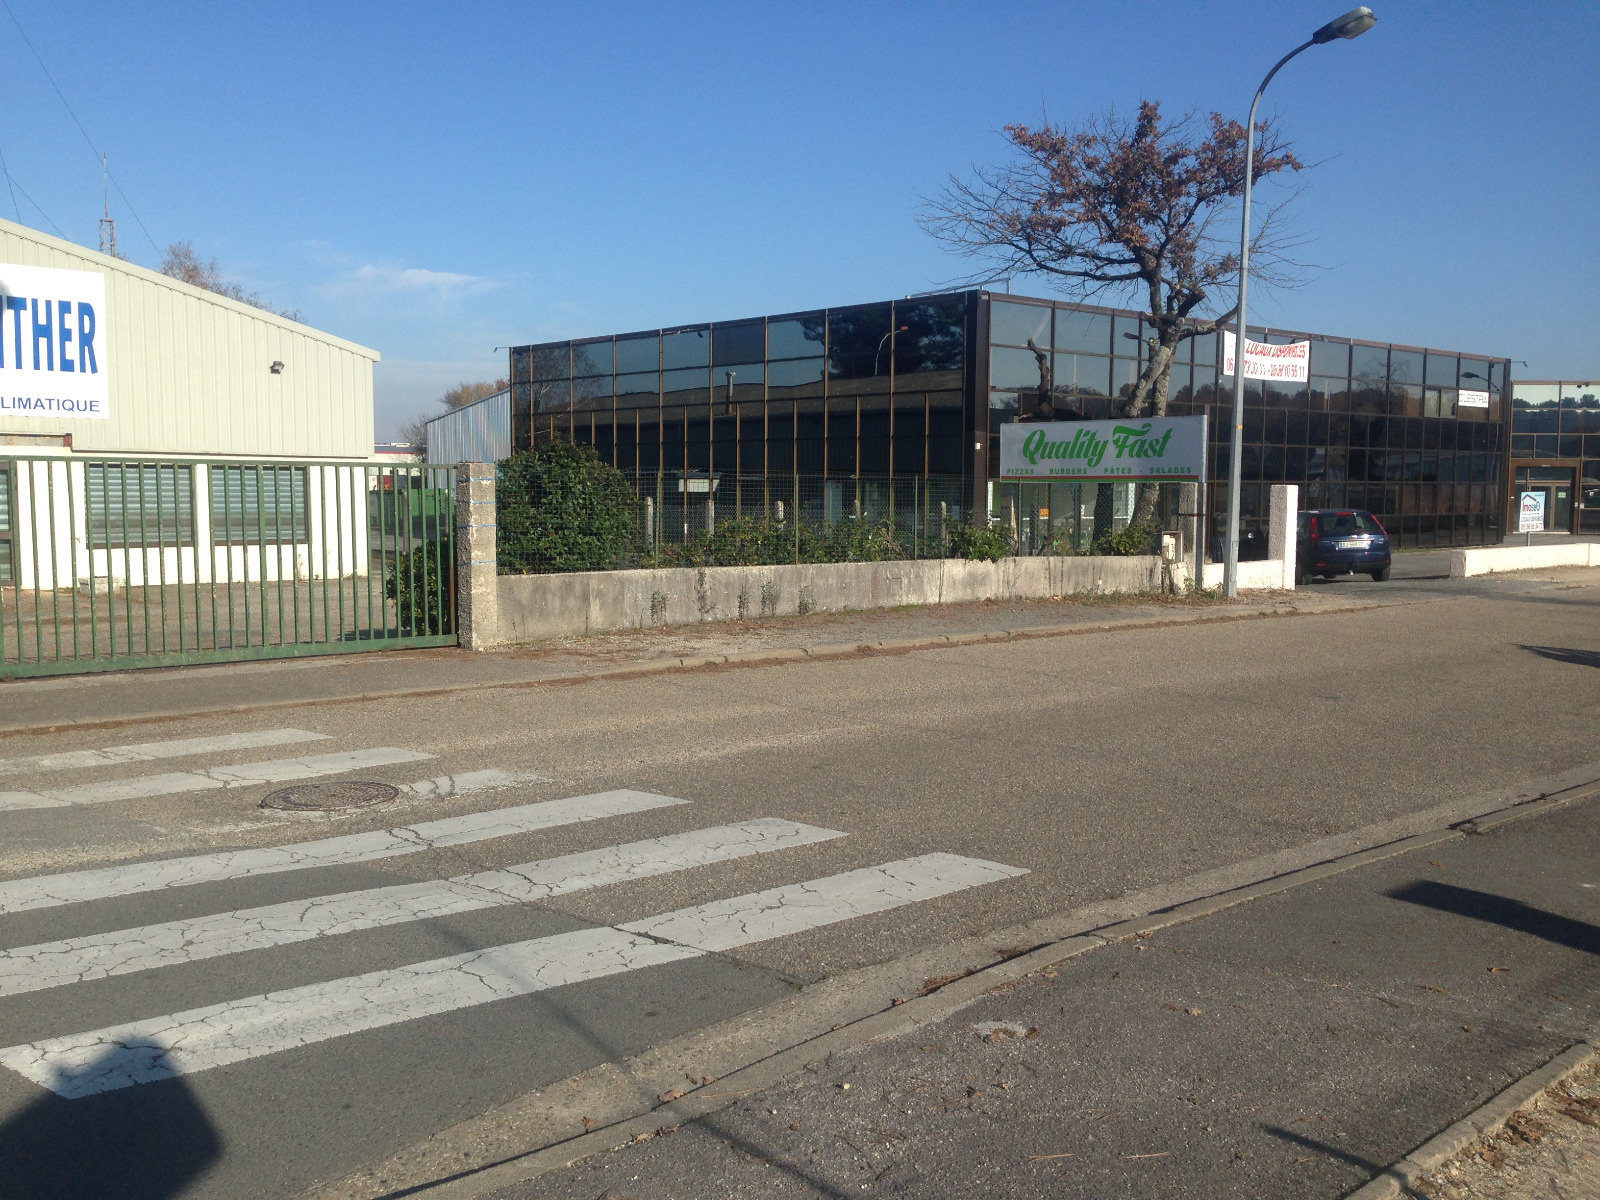 Vente Immobilier Professionnel Local commercial Le Haillan (33185)